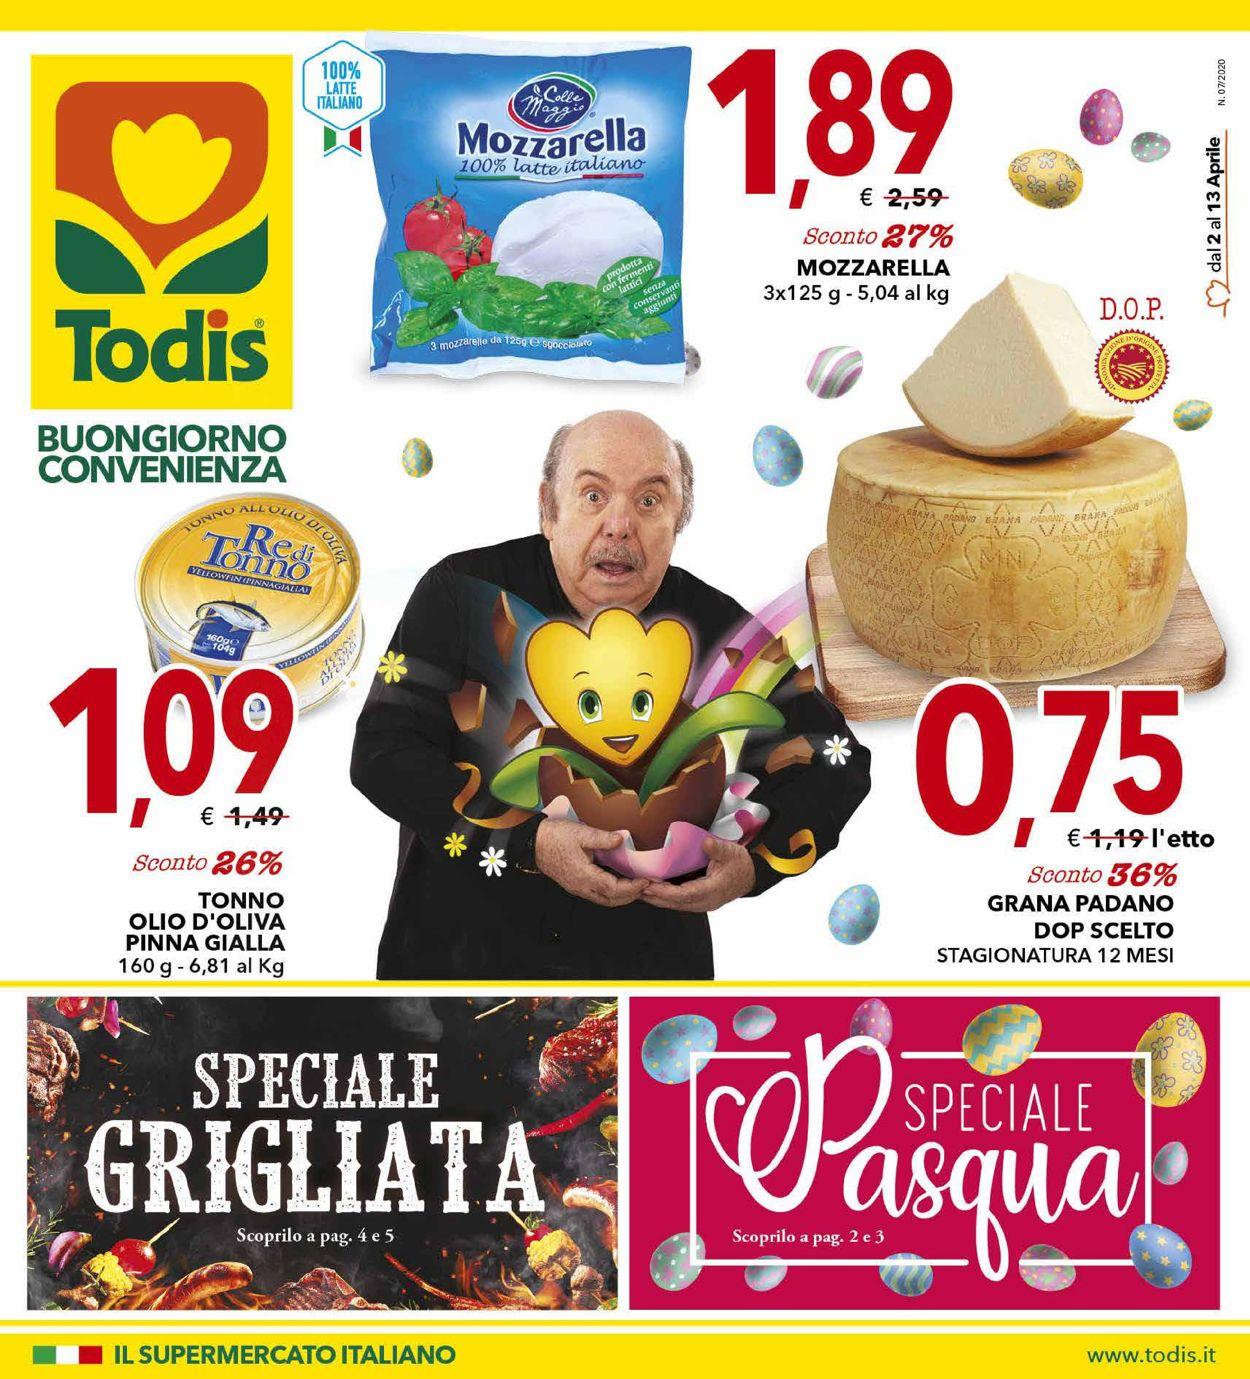 Volantino Todis - Offerte 02/04-13/04/2020